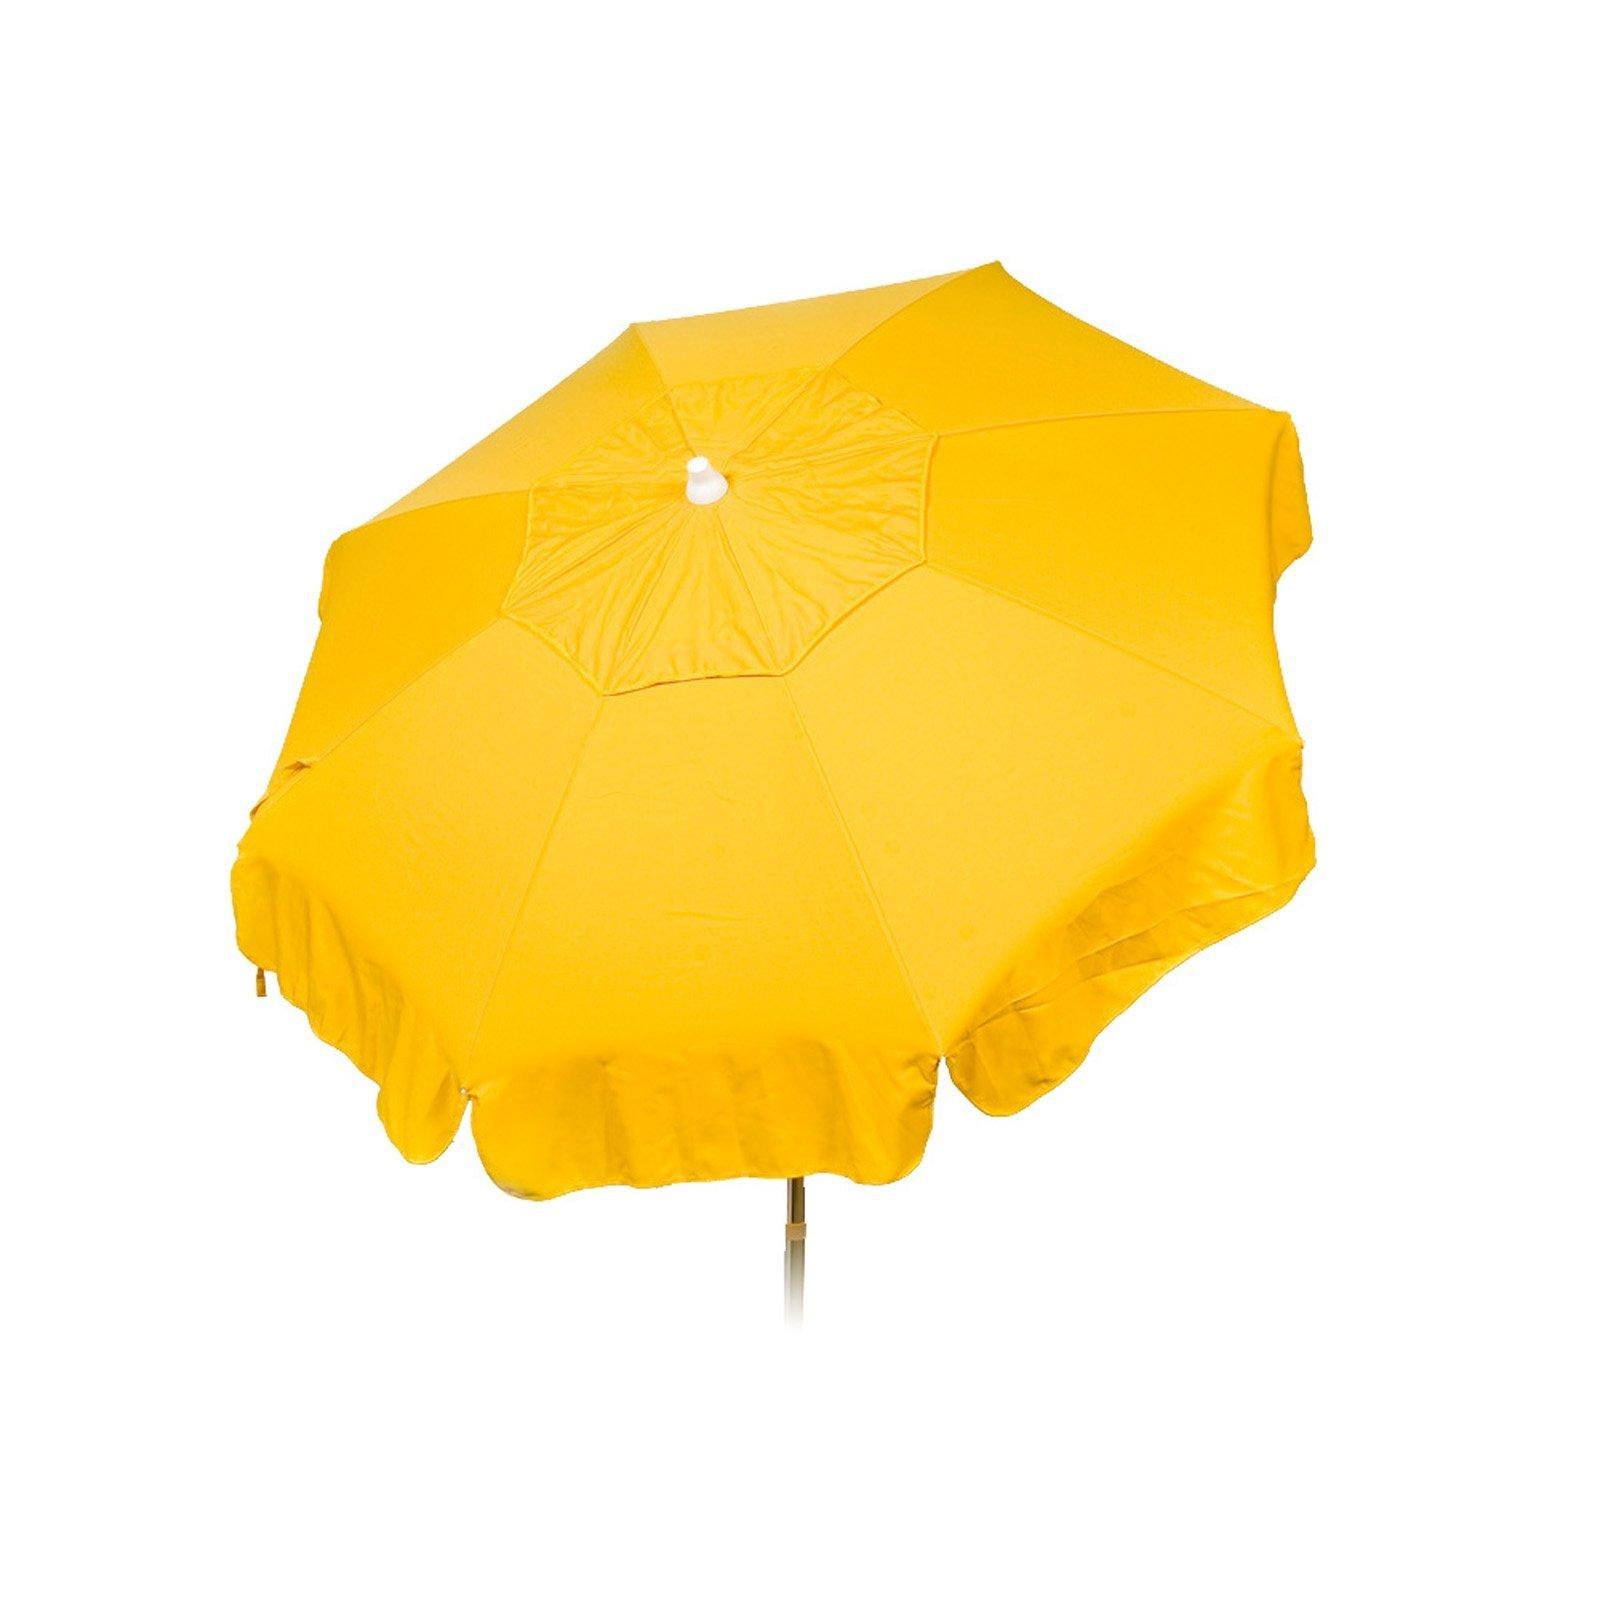 Italian 6 foot PushTilt Umbrella Acrylic Solid Yellow - Patio Pole